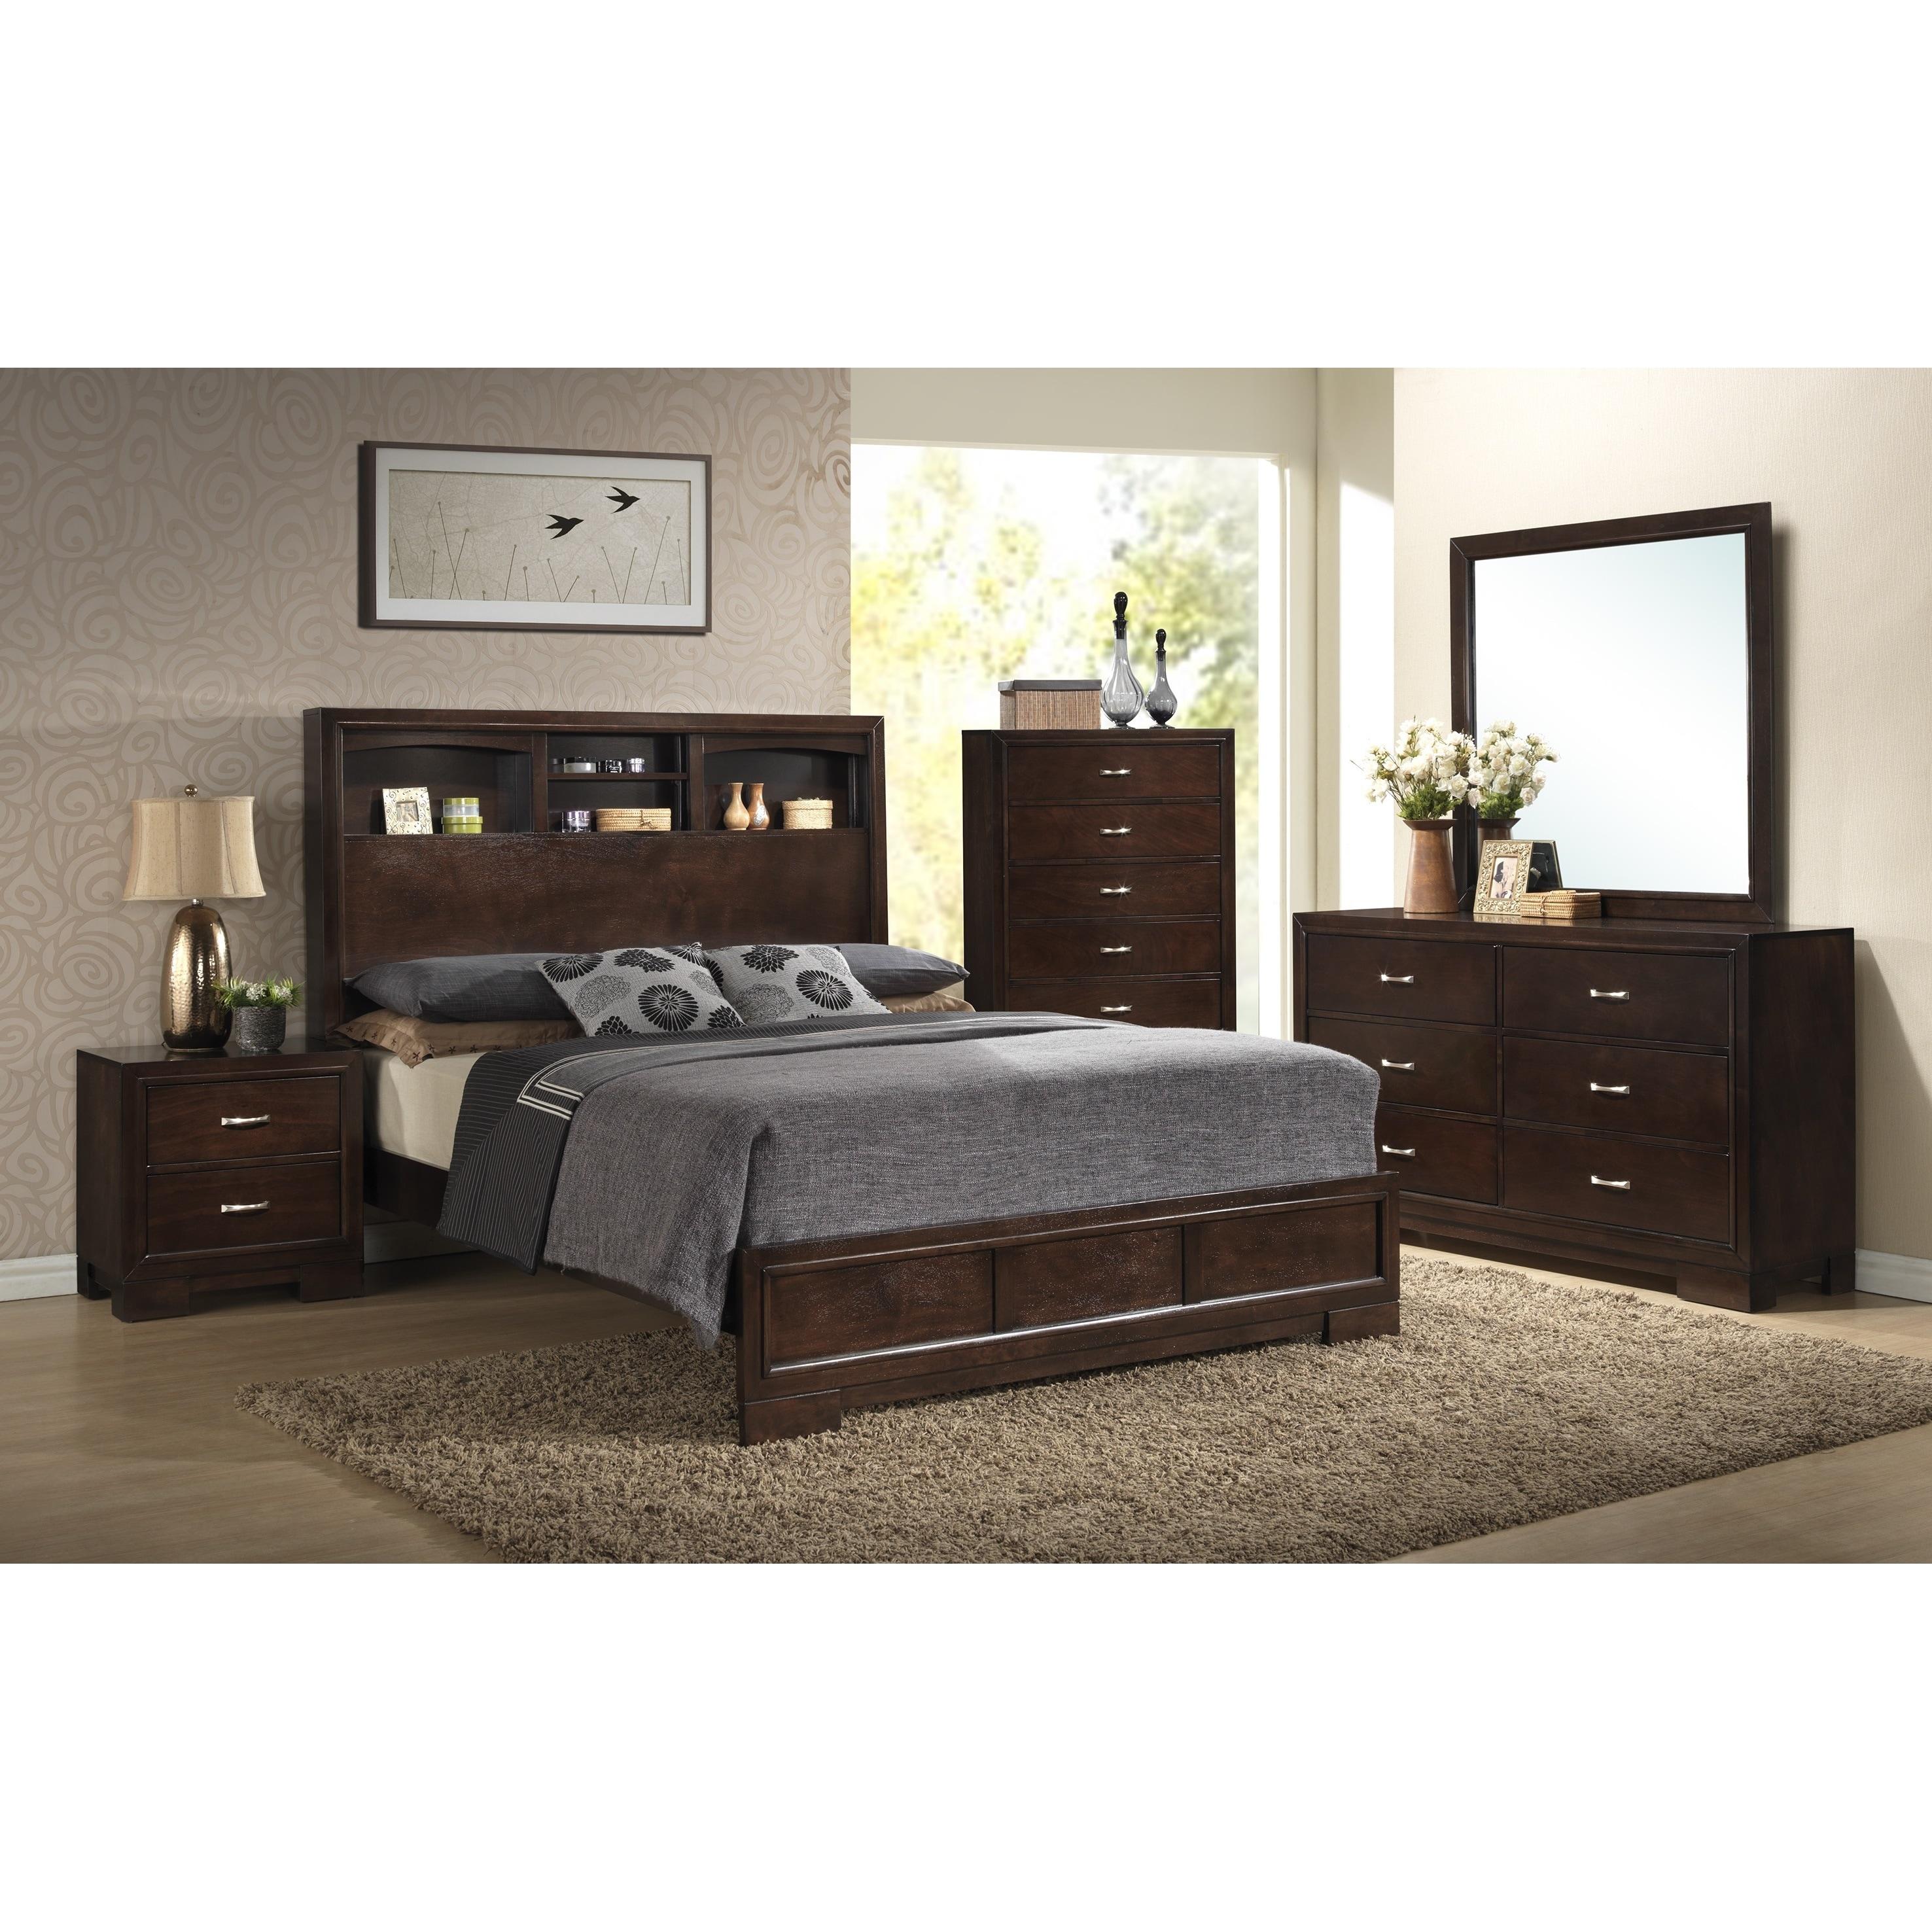 Montana Walnut Modern 4-Piece Wood Bedroom Set with King Bed, Dresser,  Mirror, Nightstand, Chest